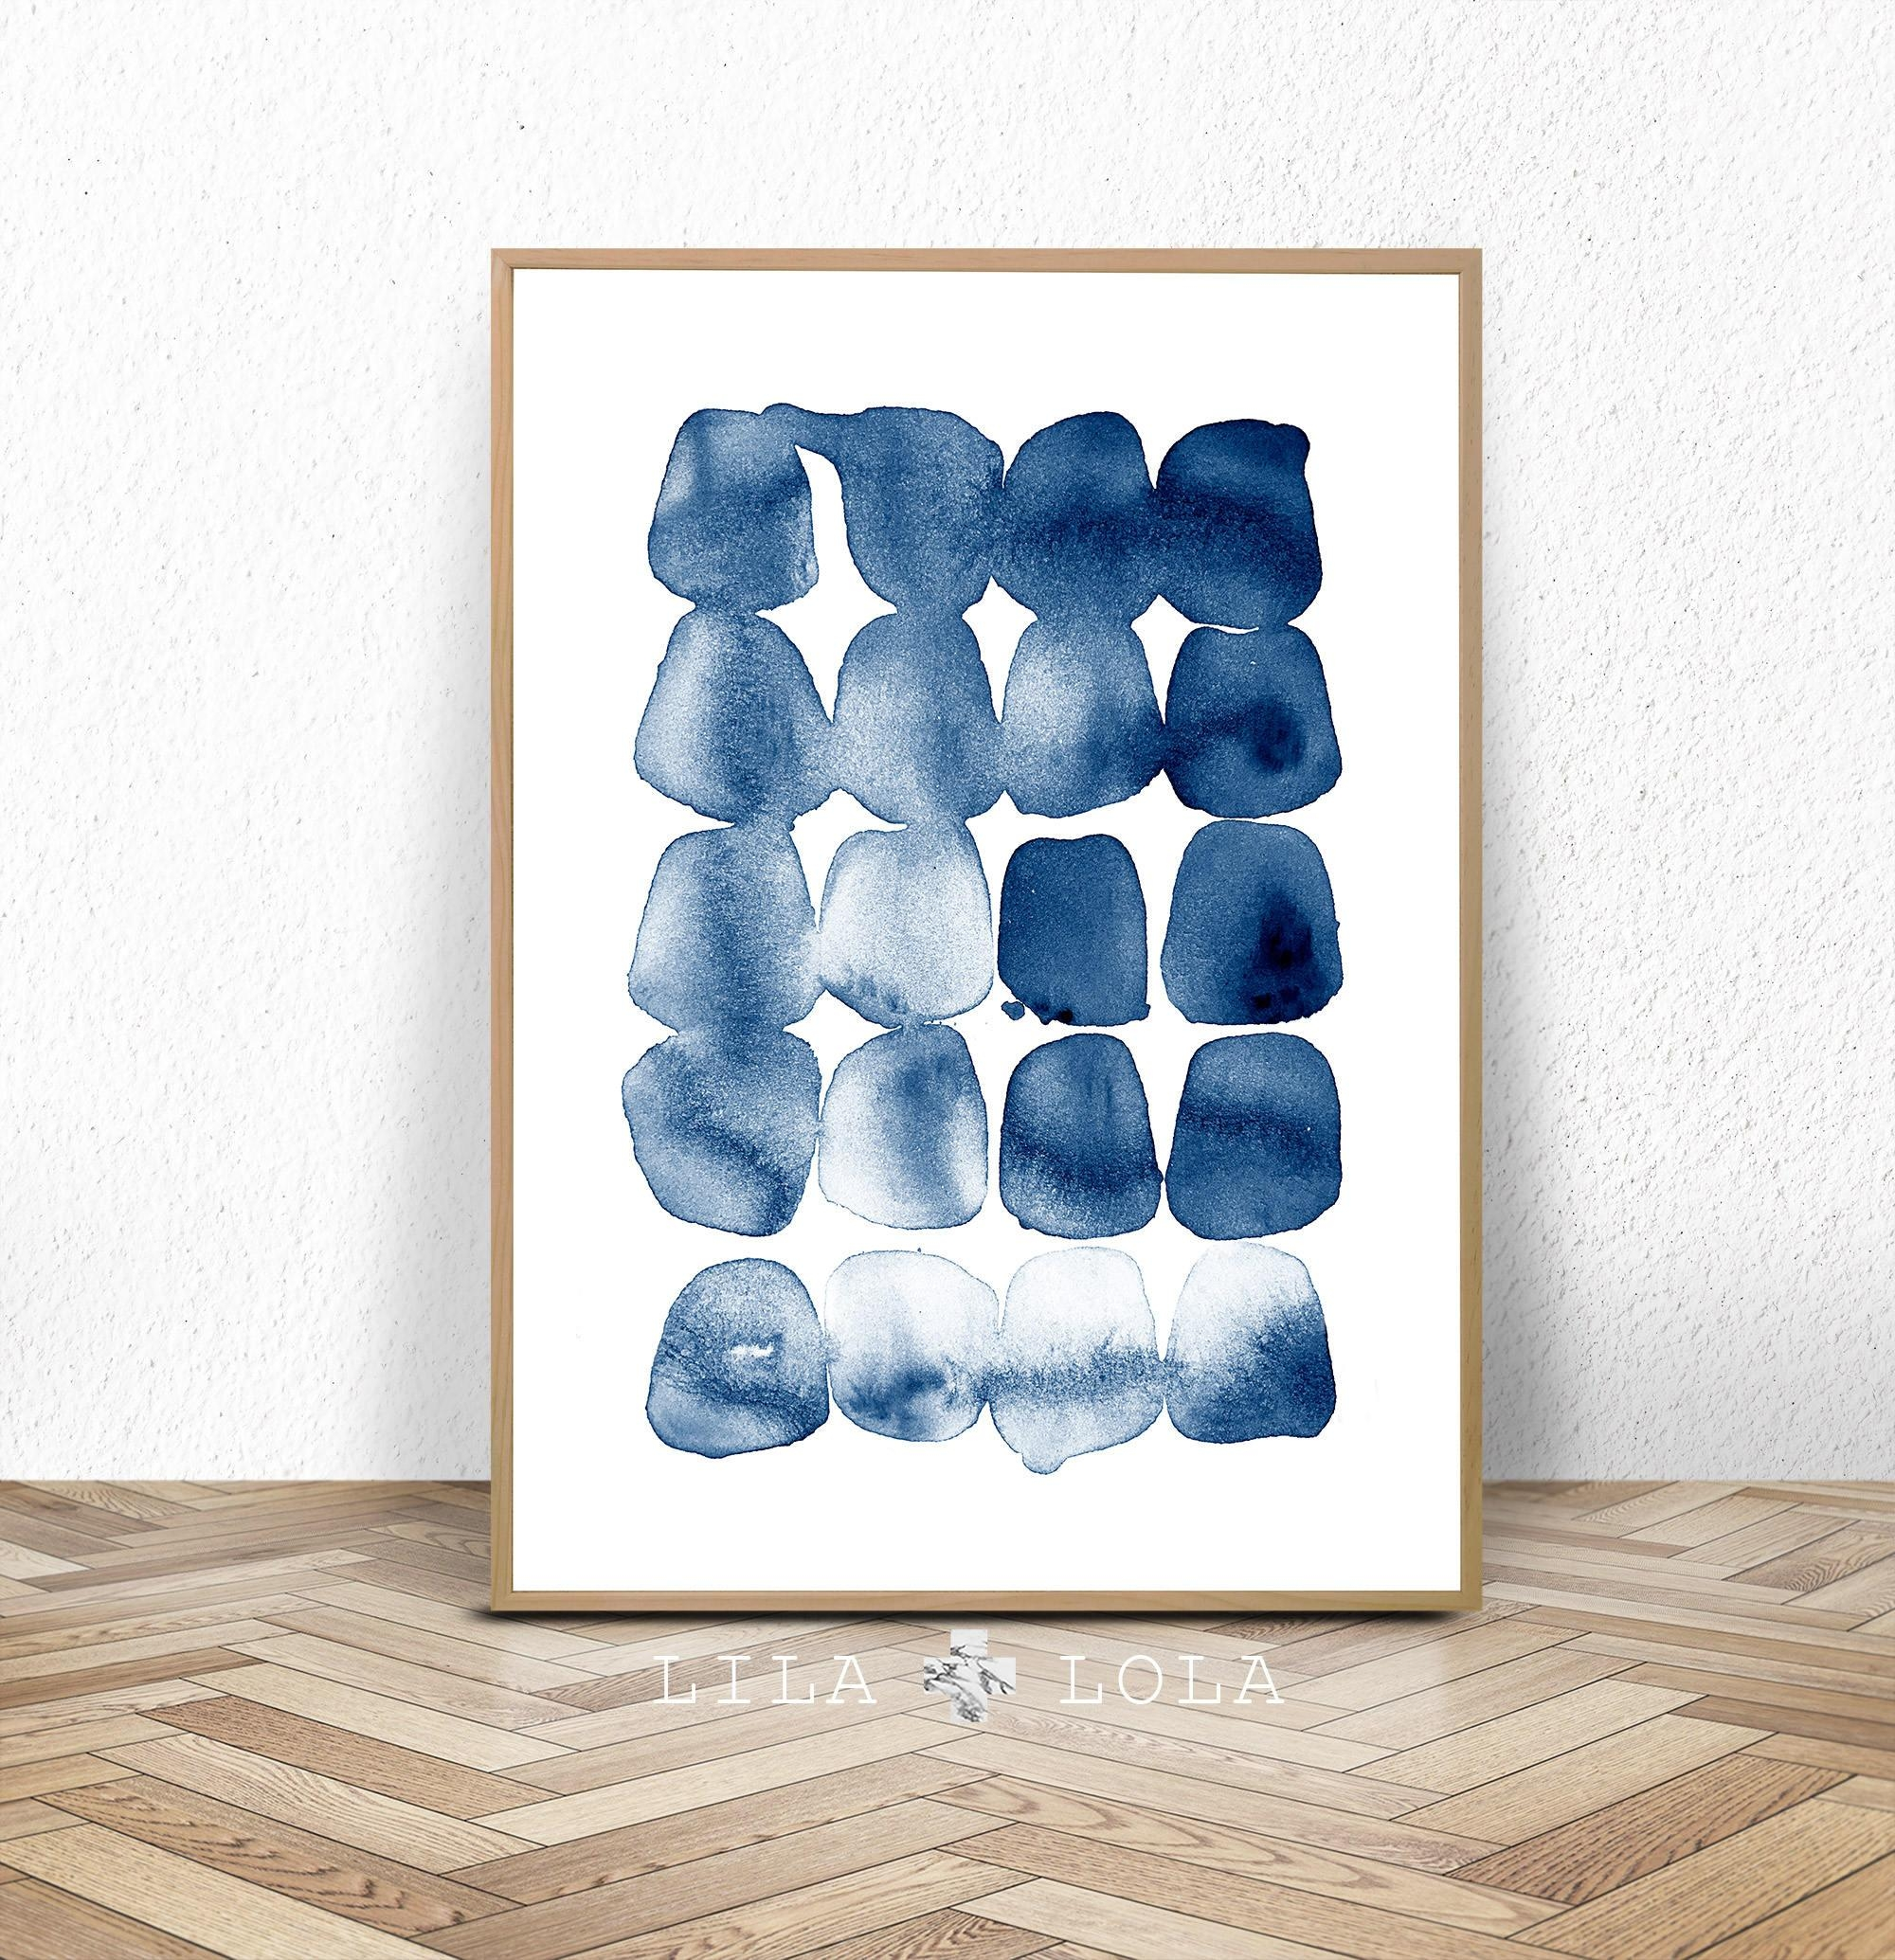 Abstract Print Watercolour Wall Art Modern Minimalist In Blue Wall Art (View 10 of 20)